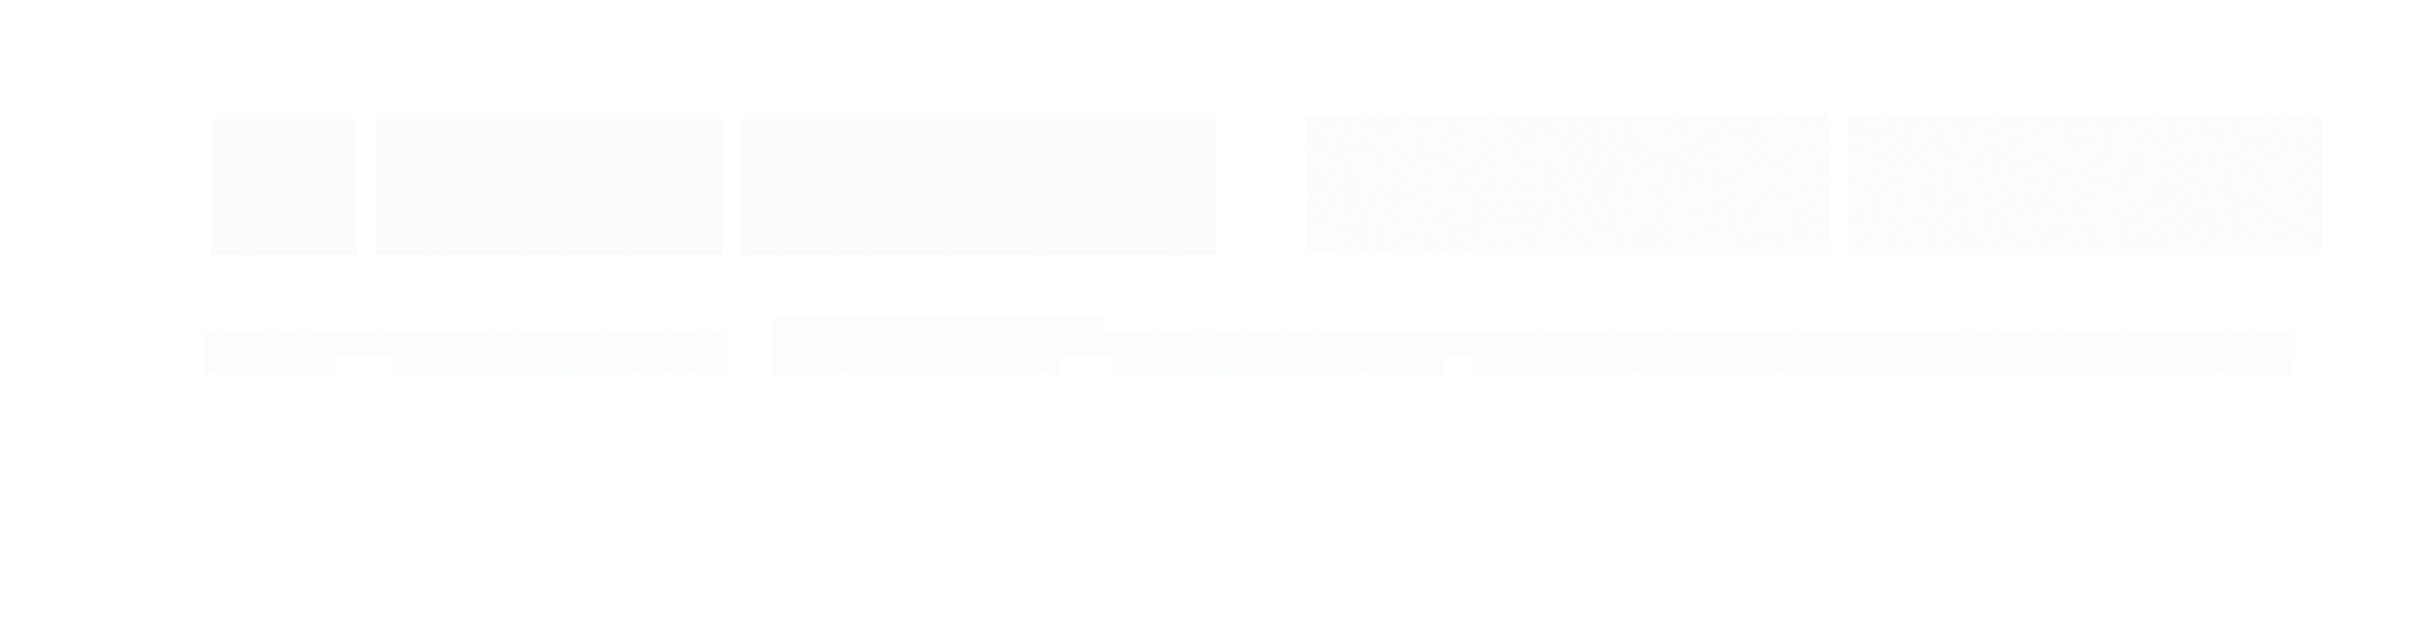 Expert-separation..